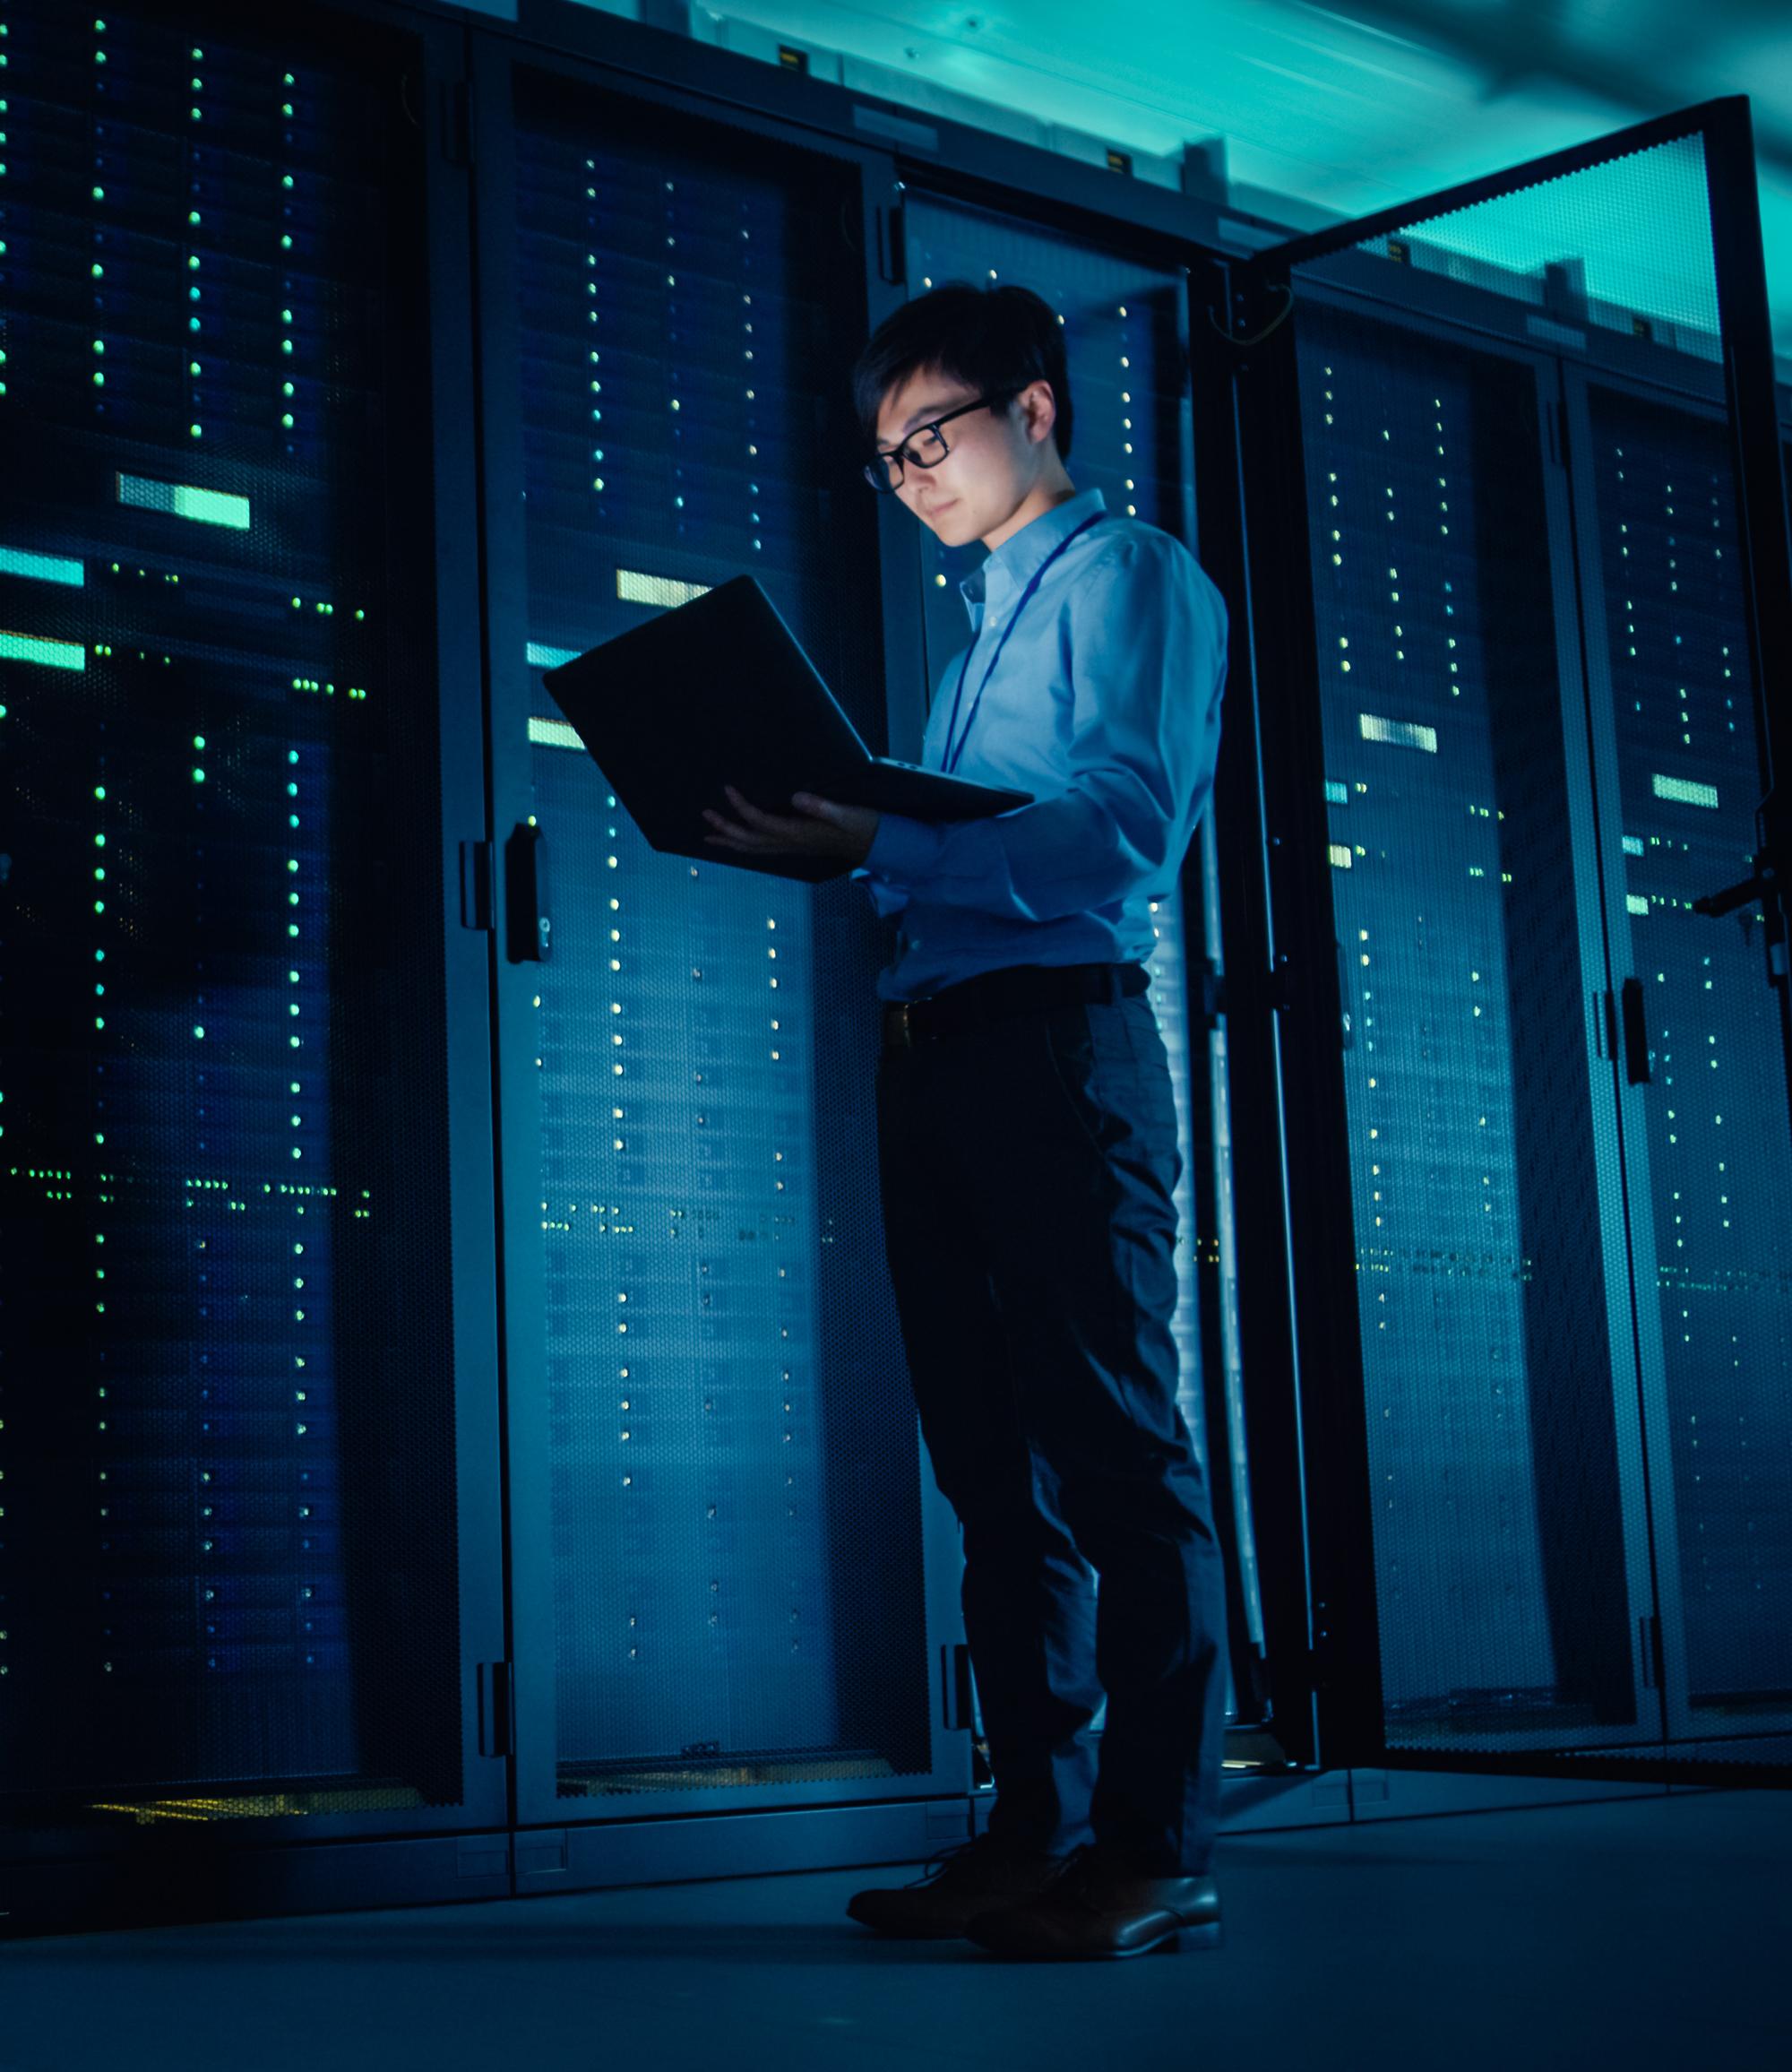 Male IT Technician Running Maintenance Programme on a Laptop